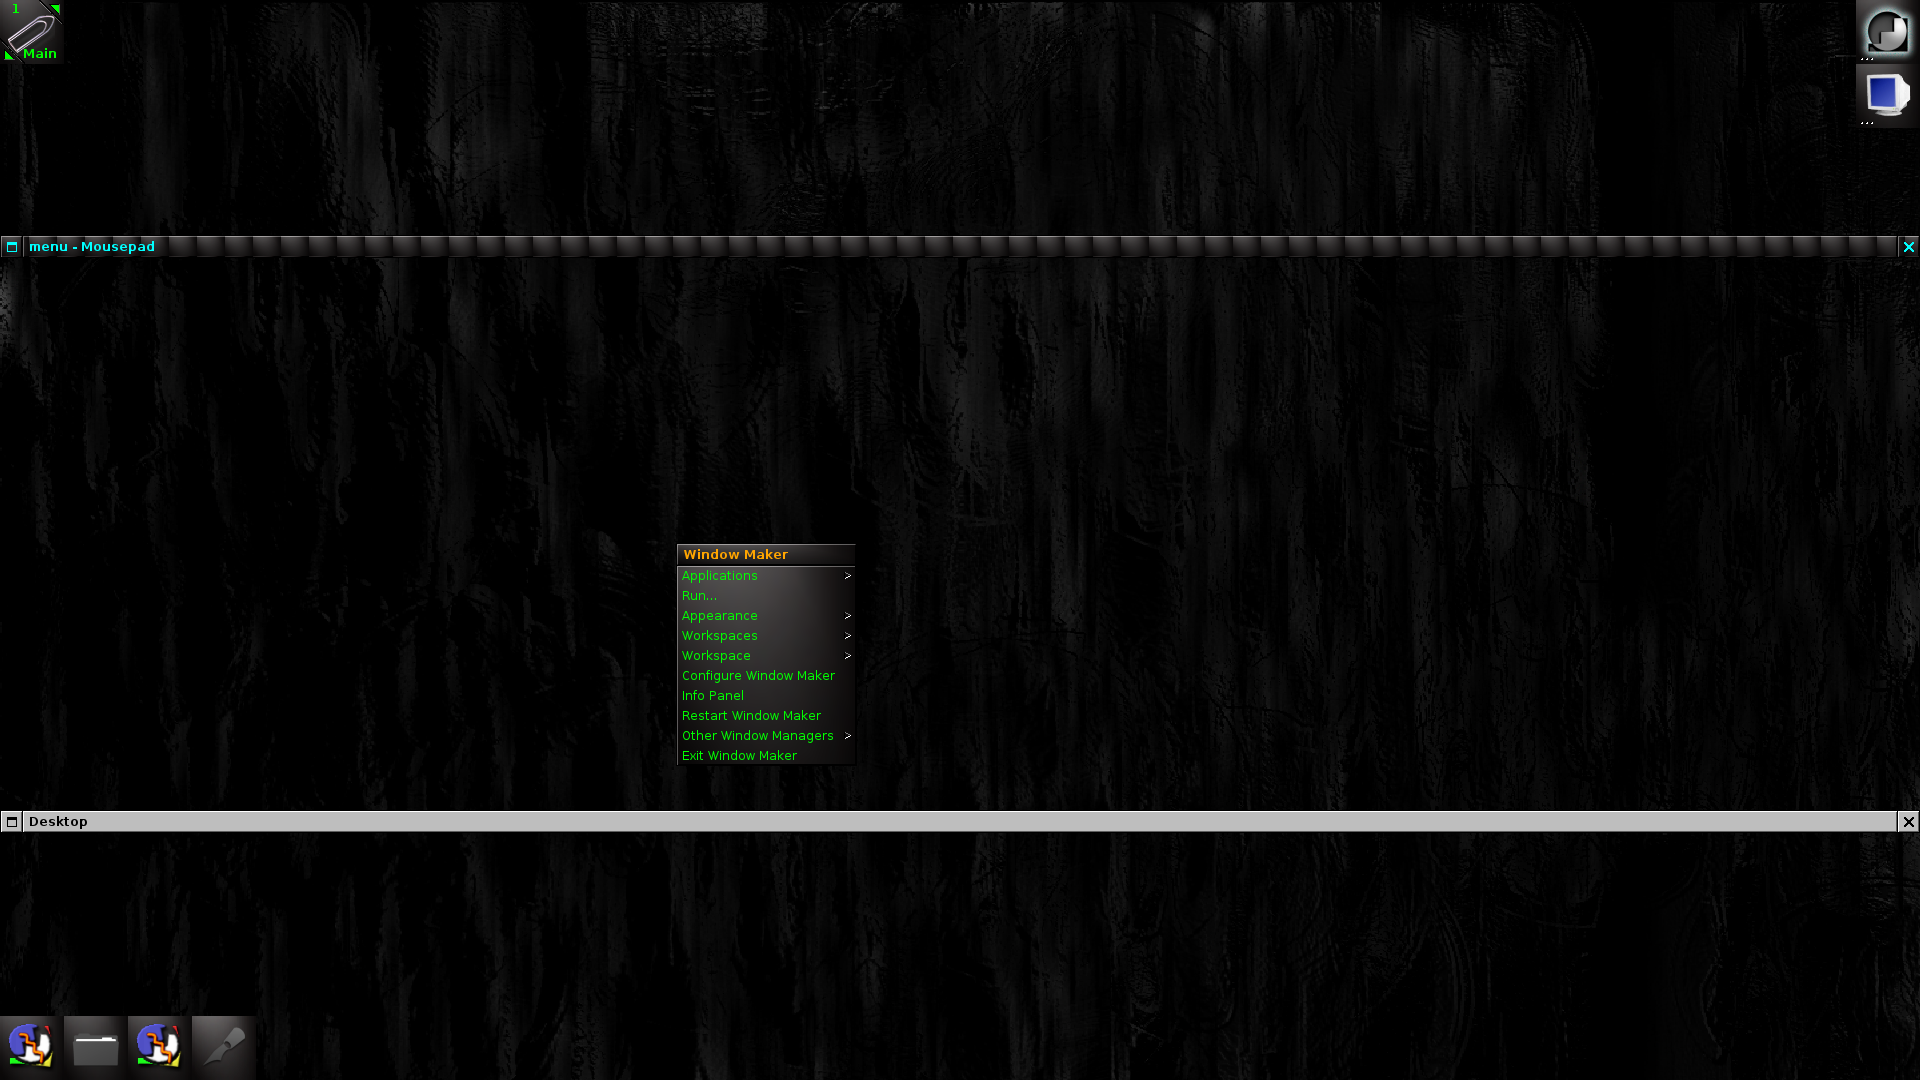 jwm screenshot, jwm screen, jwm linux. jwm themes